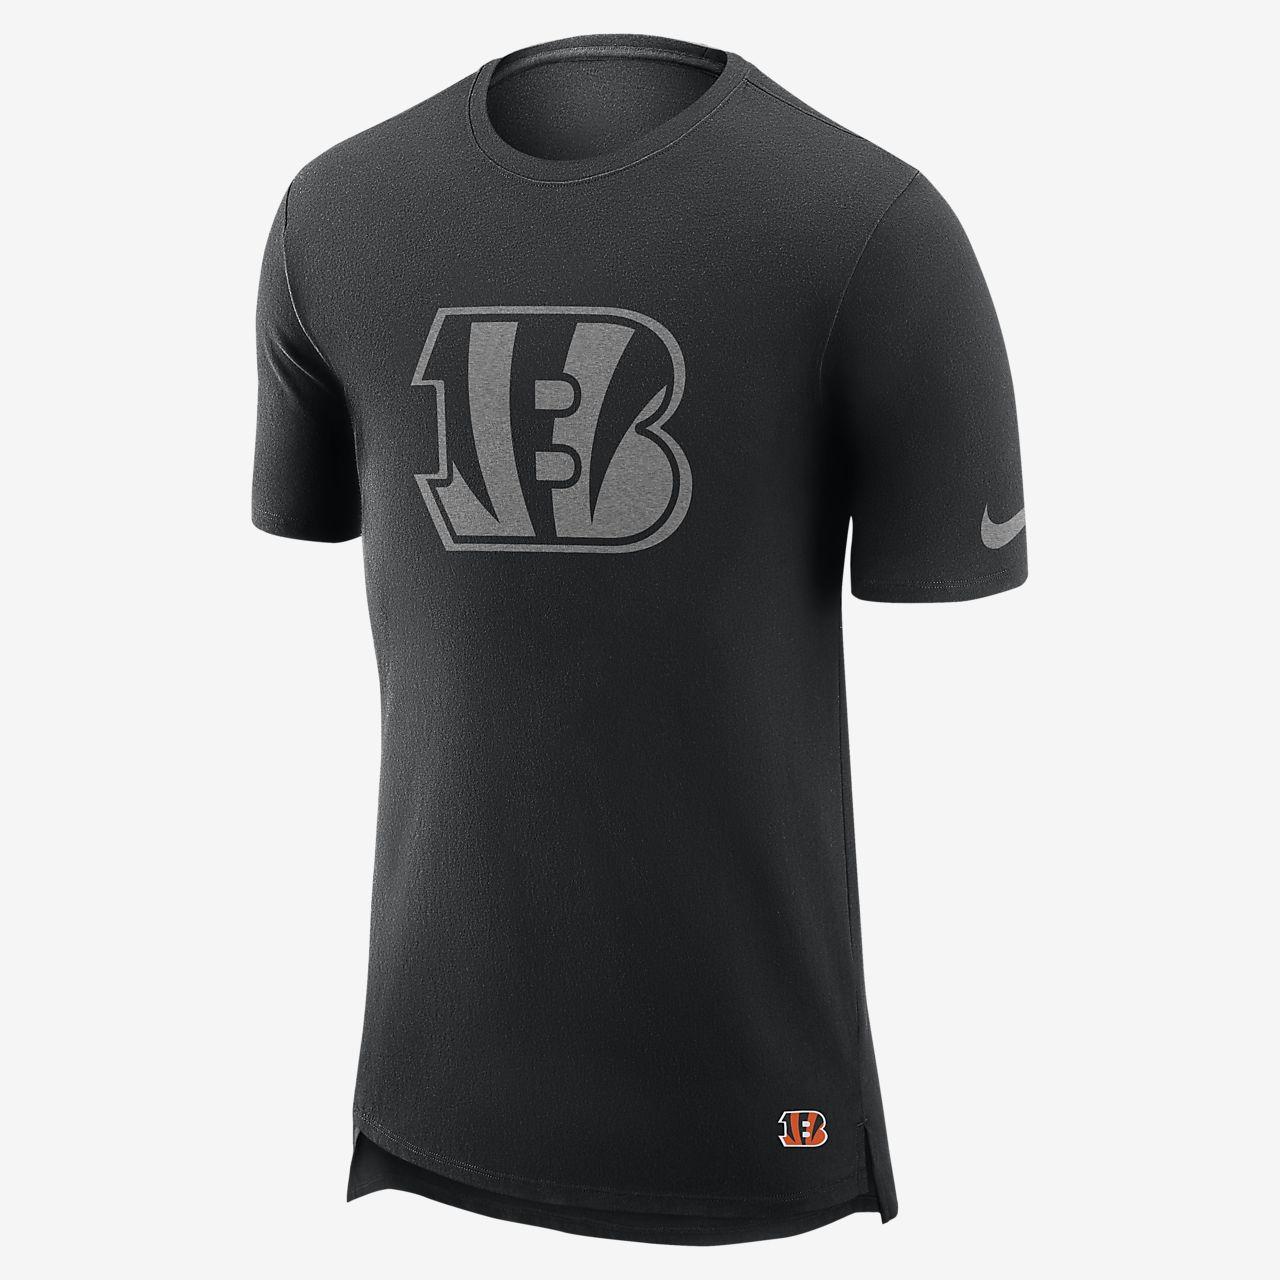 Playera para hombre Nike Enzyme Droptail (NFL Bengals)